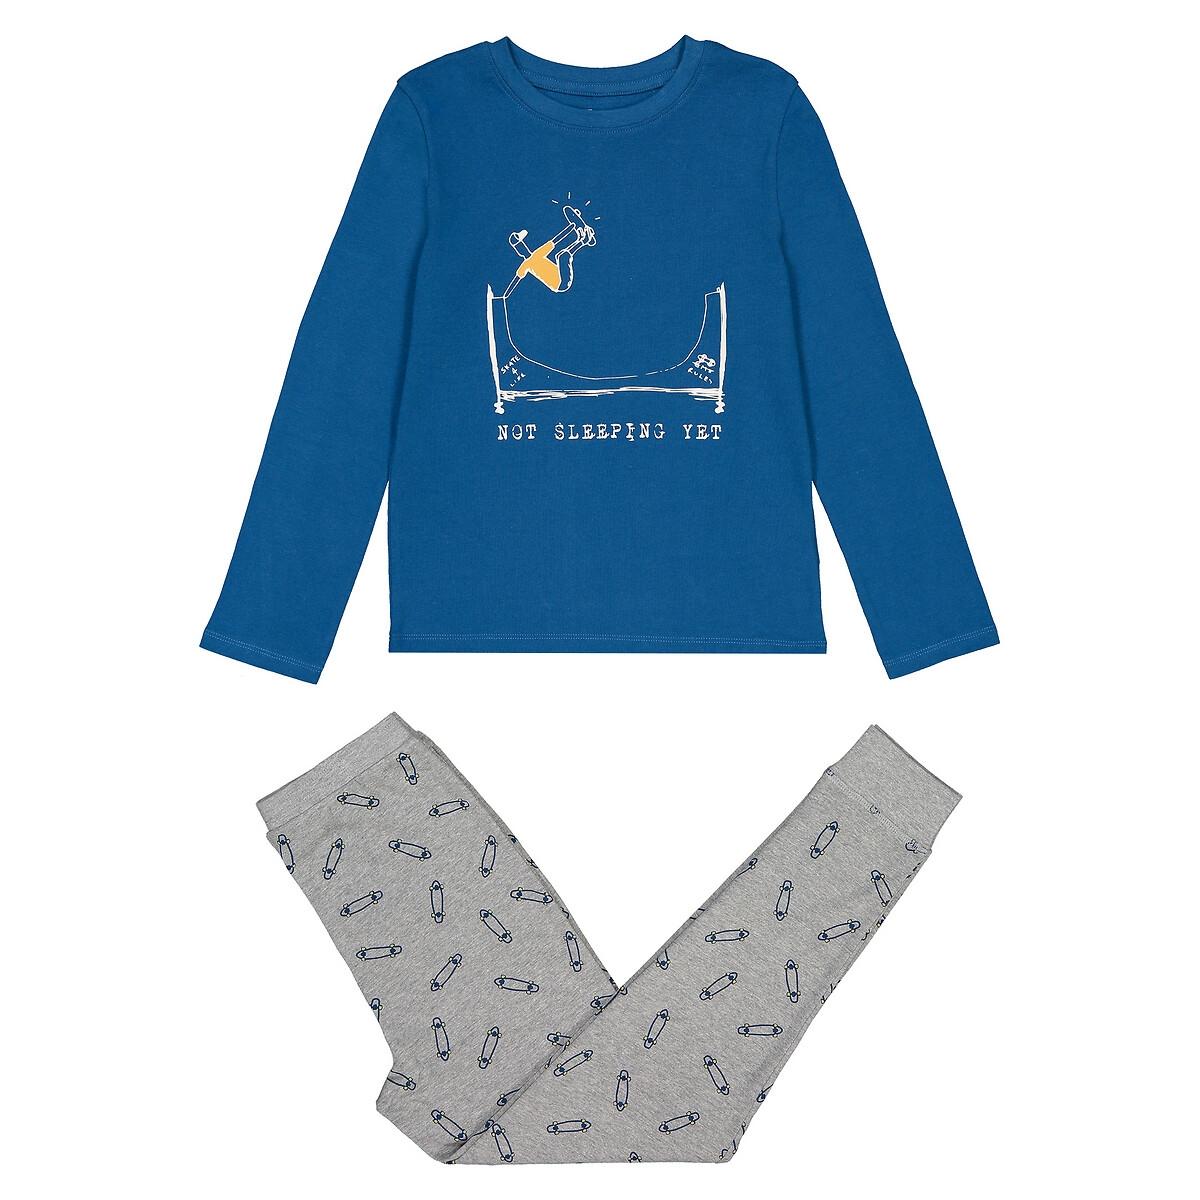 Пижама LaRedoute Из биохлопка с принтом скейтборд 3-12 лет 6 лет - 114 см синий скейтборды oxelo скейтборд детский play120 bear синий